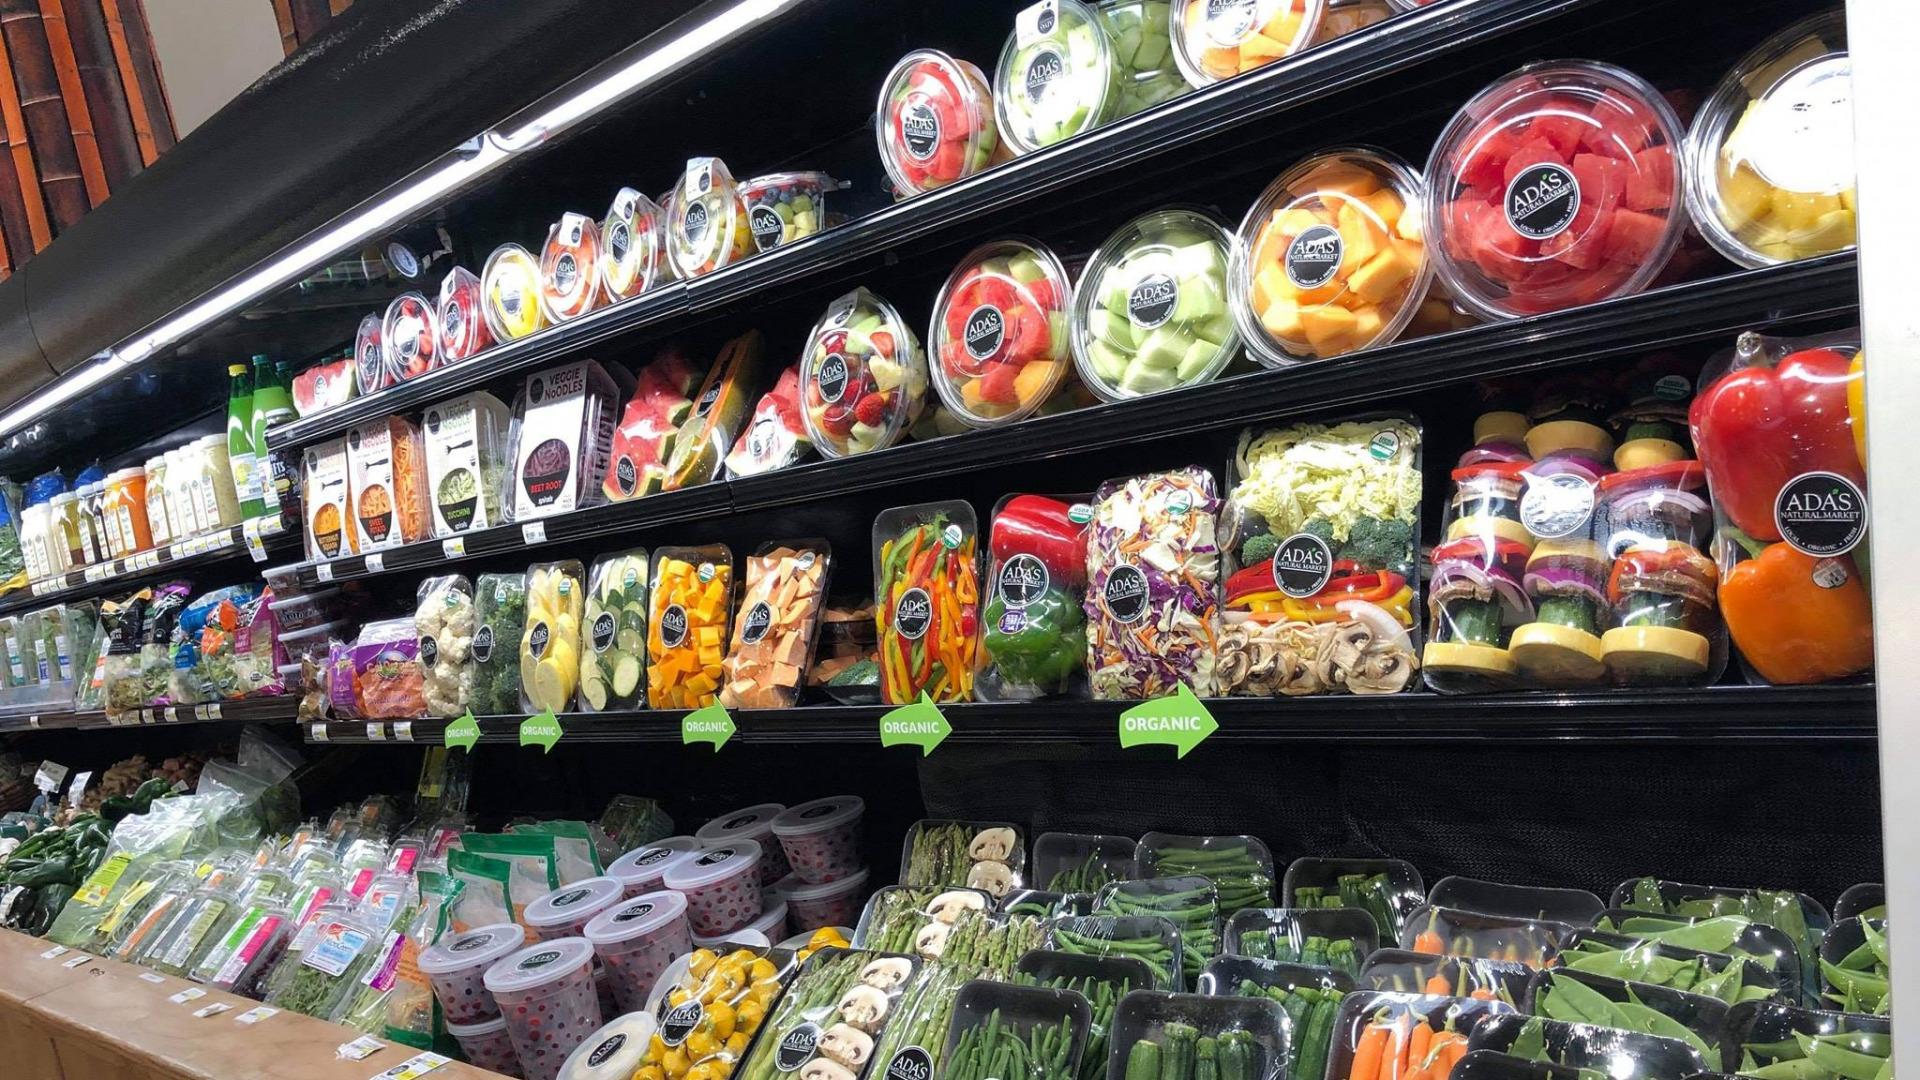 ada's natural market fridge